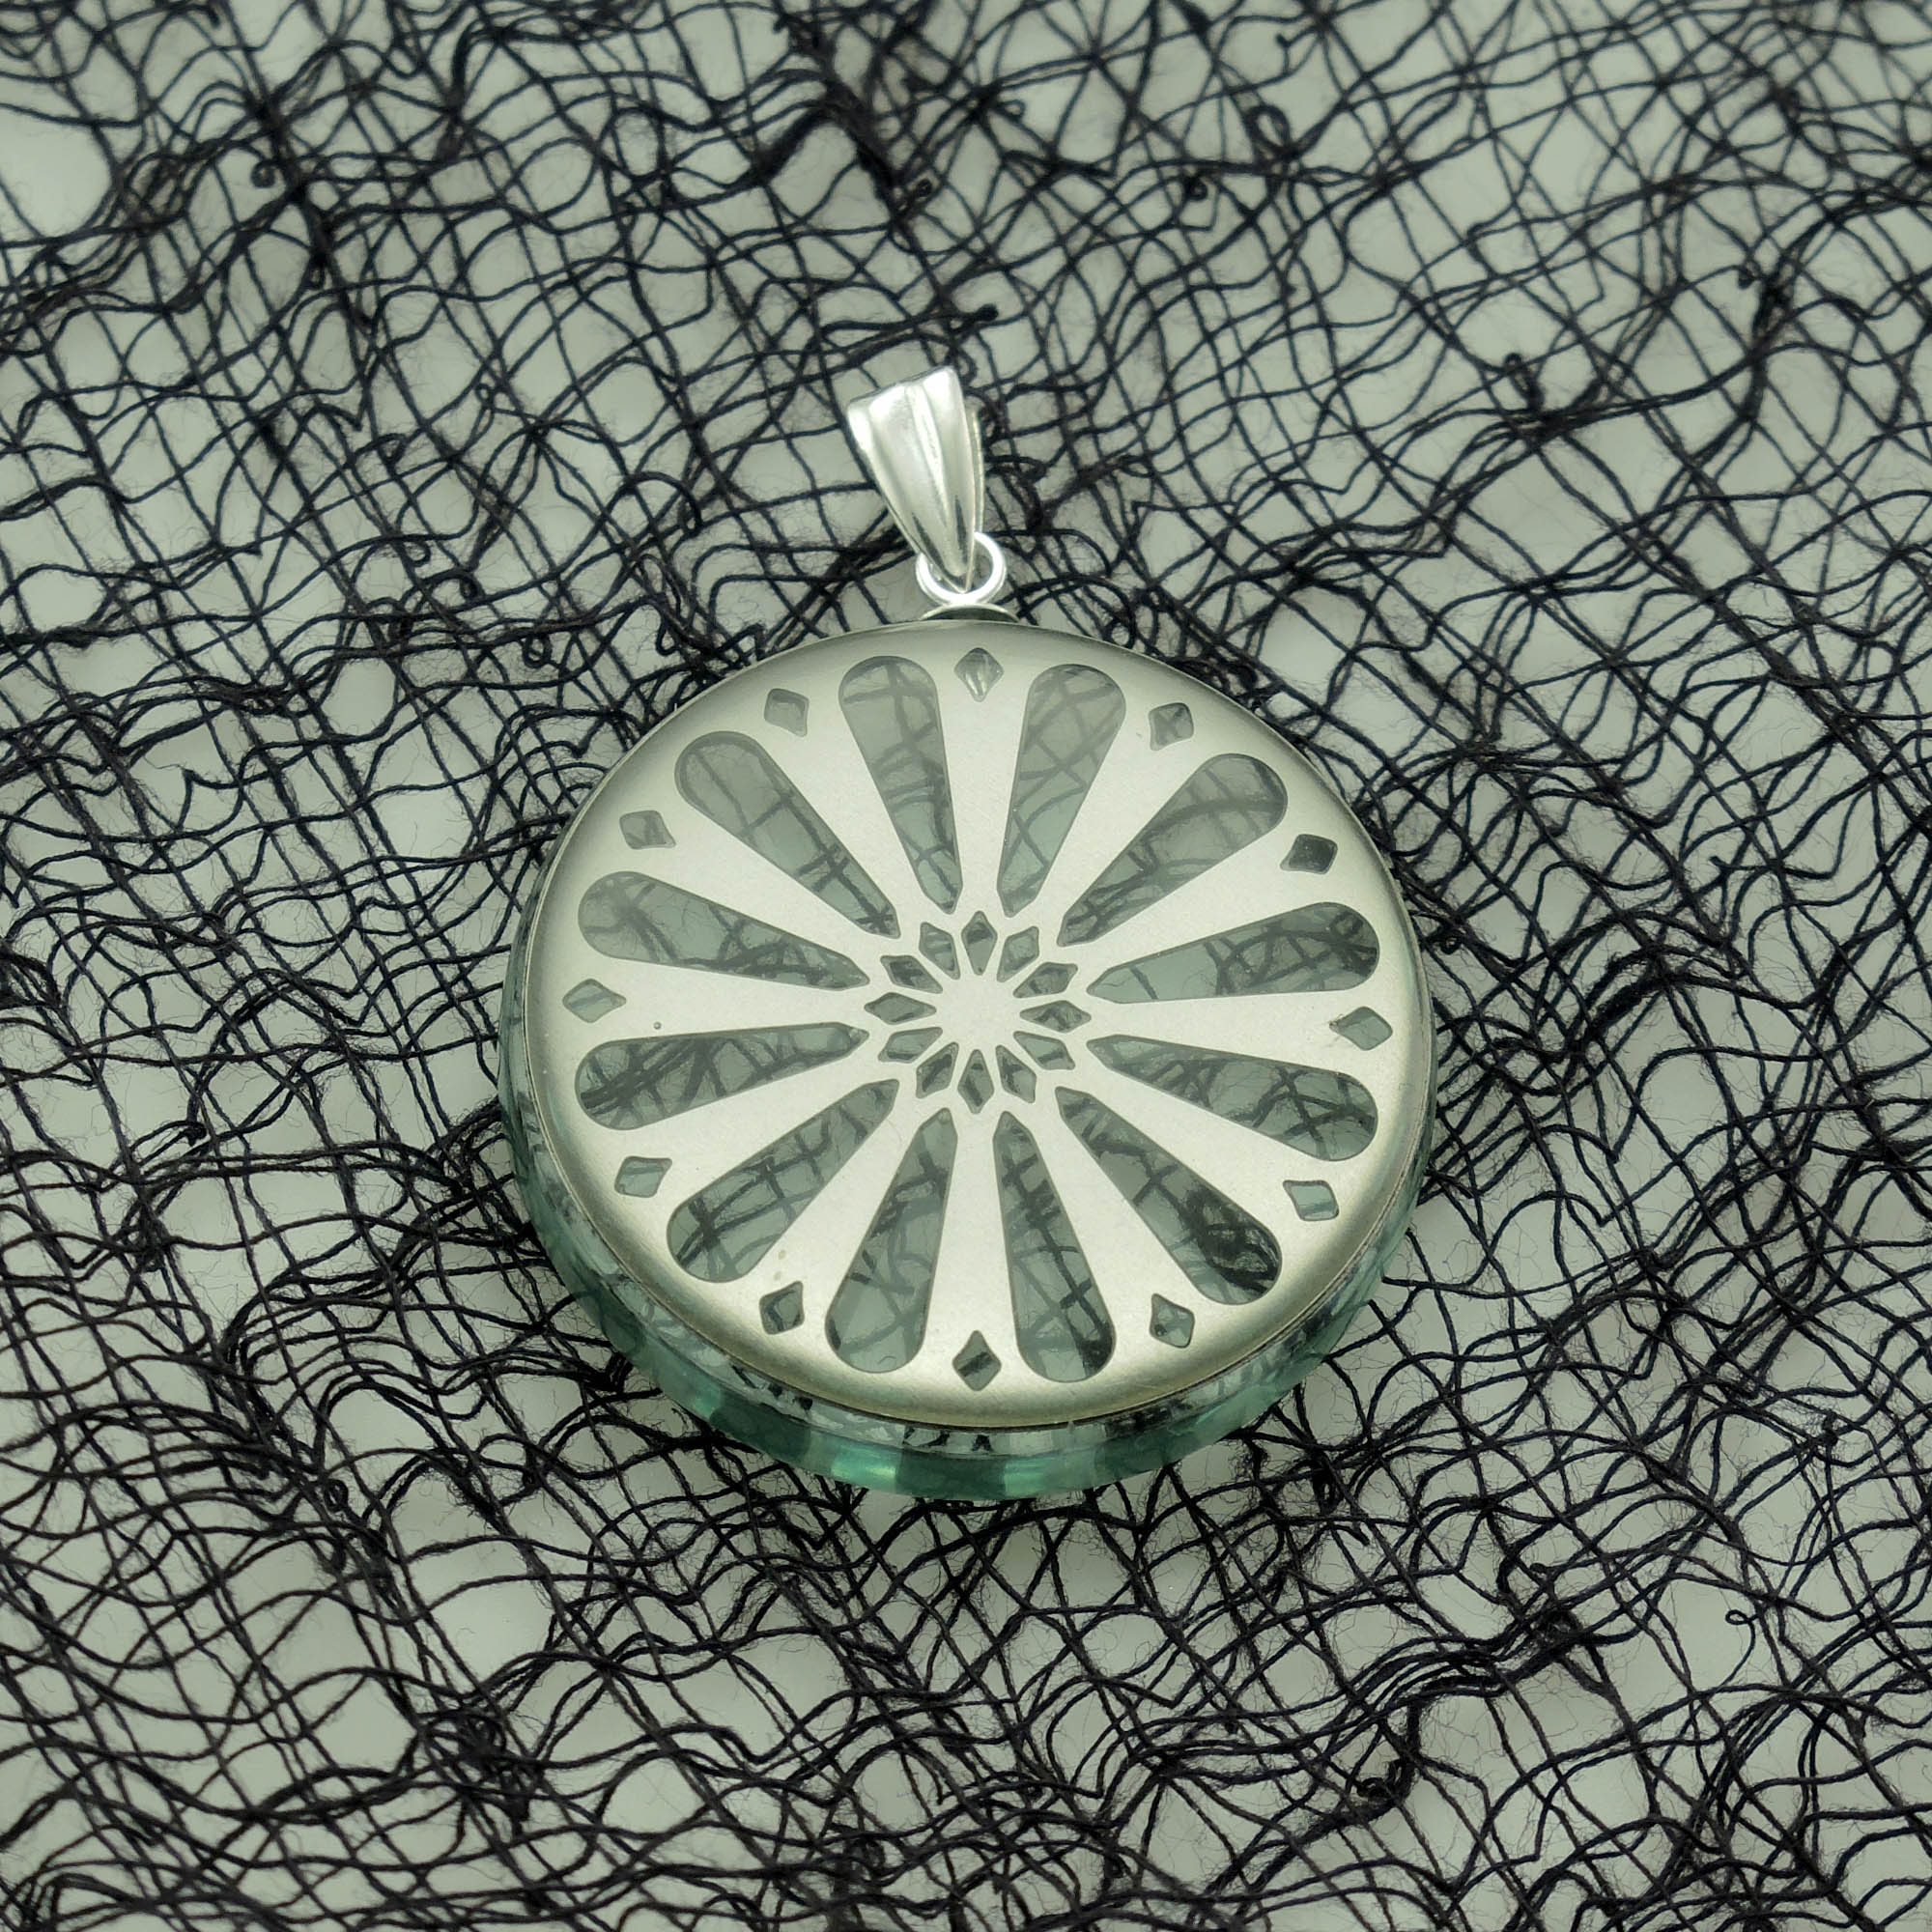 Sunburst Stainless Steel and Acrylic Glass Pendant